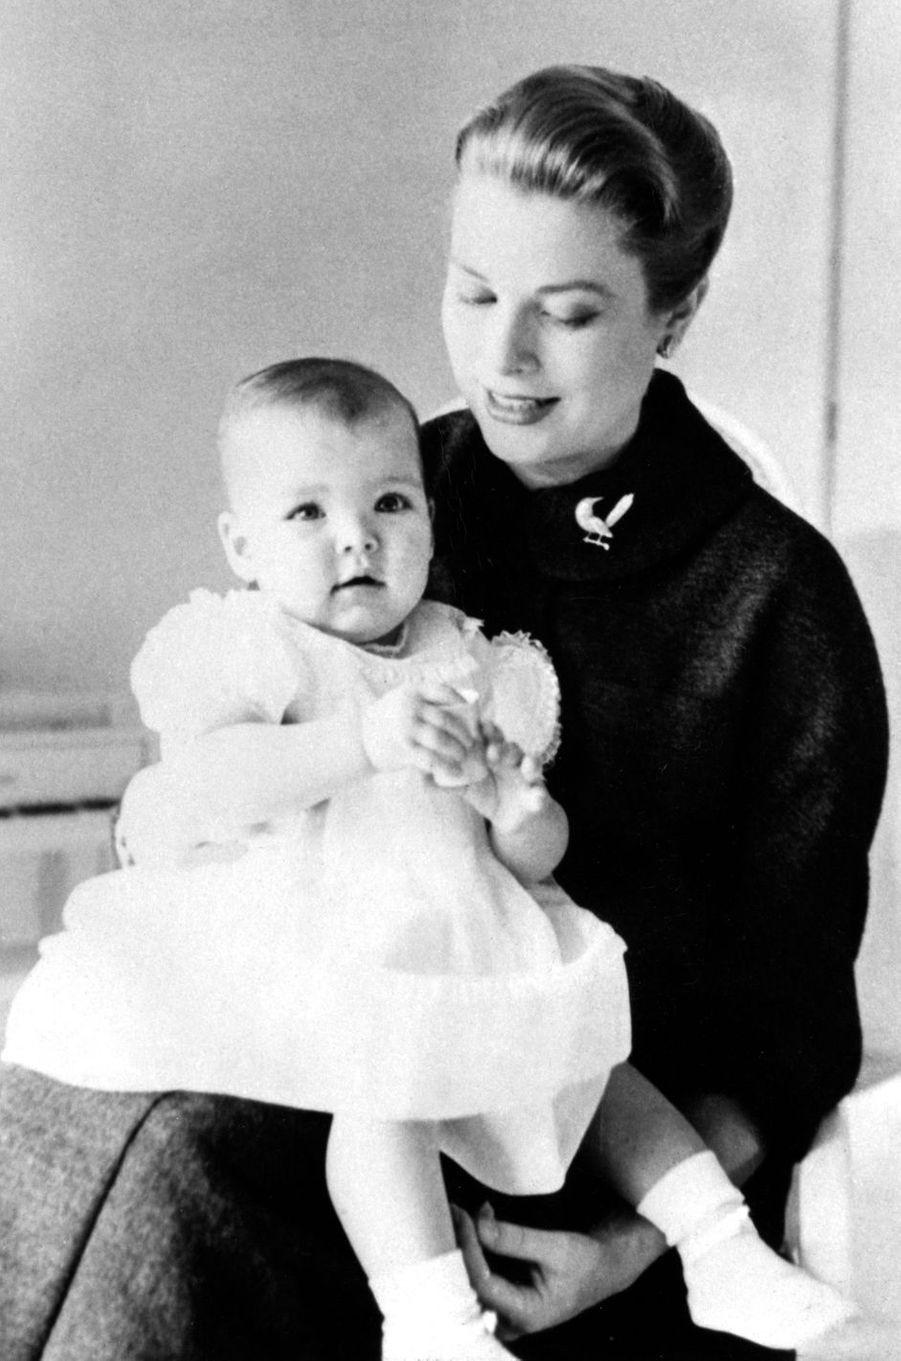 La princesse Caroline de Monaco avec sa maman la princesse Grace en janvier 1958